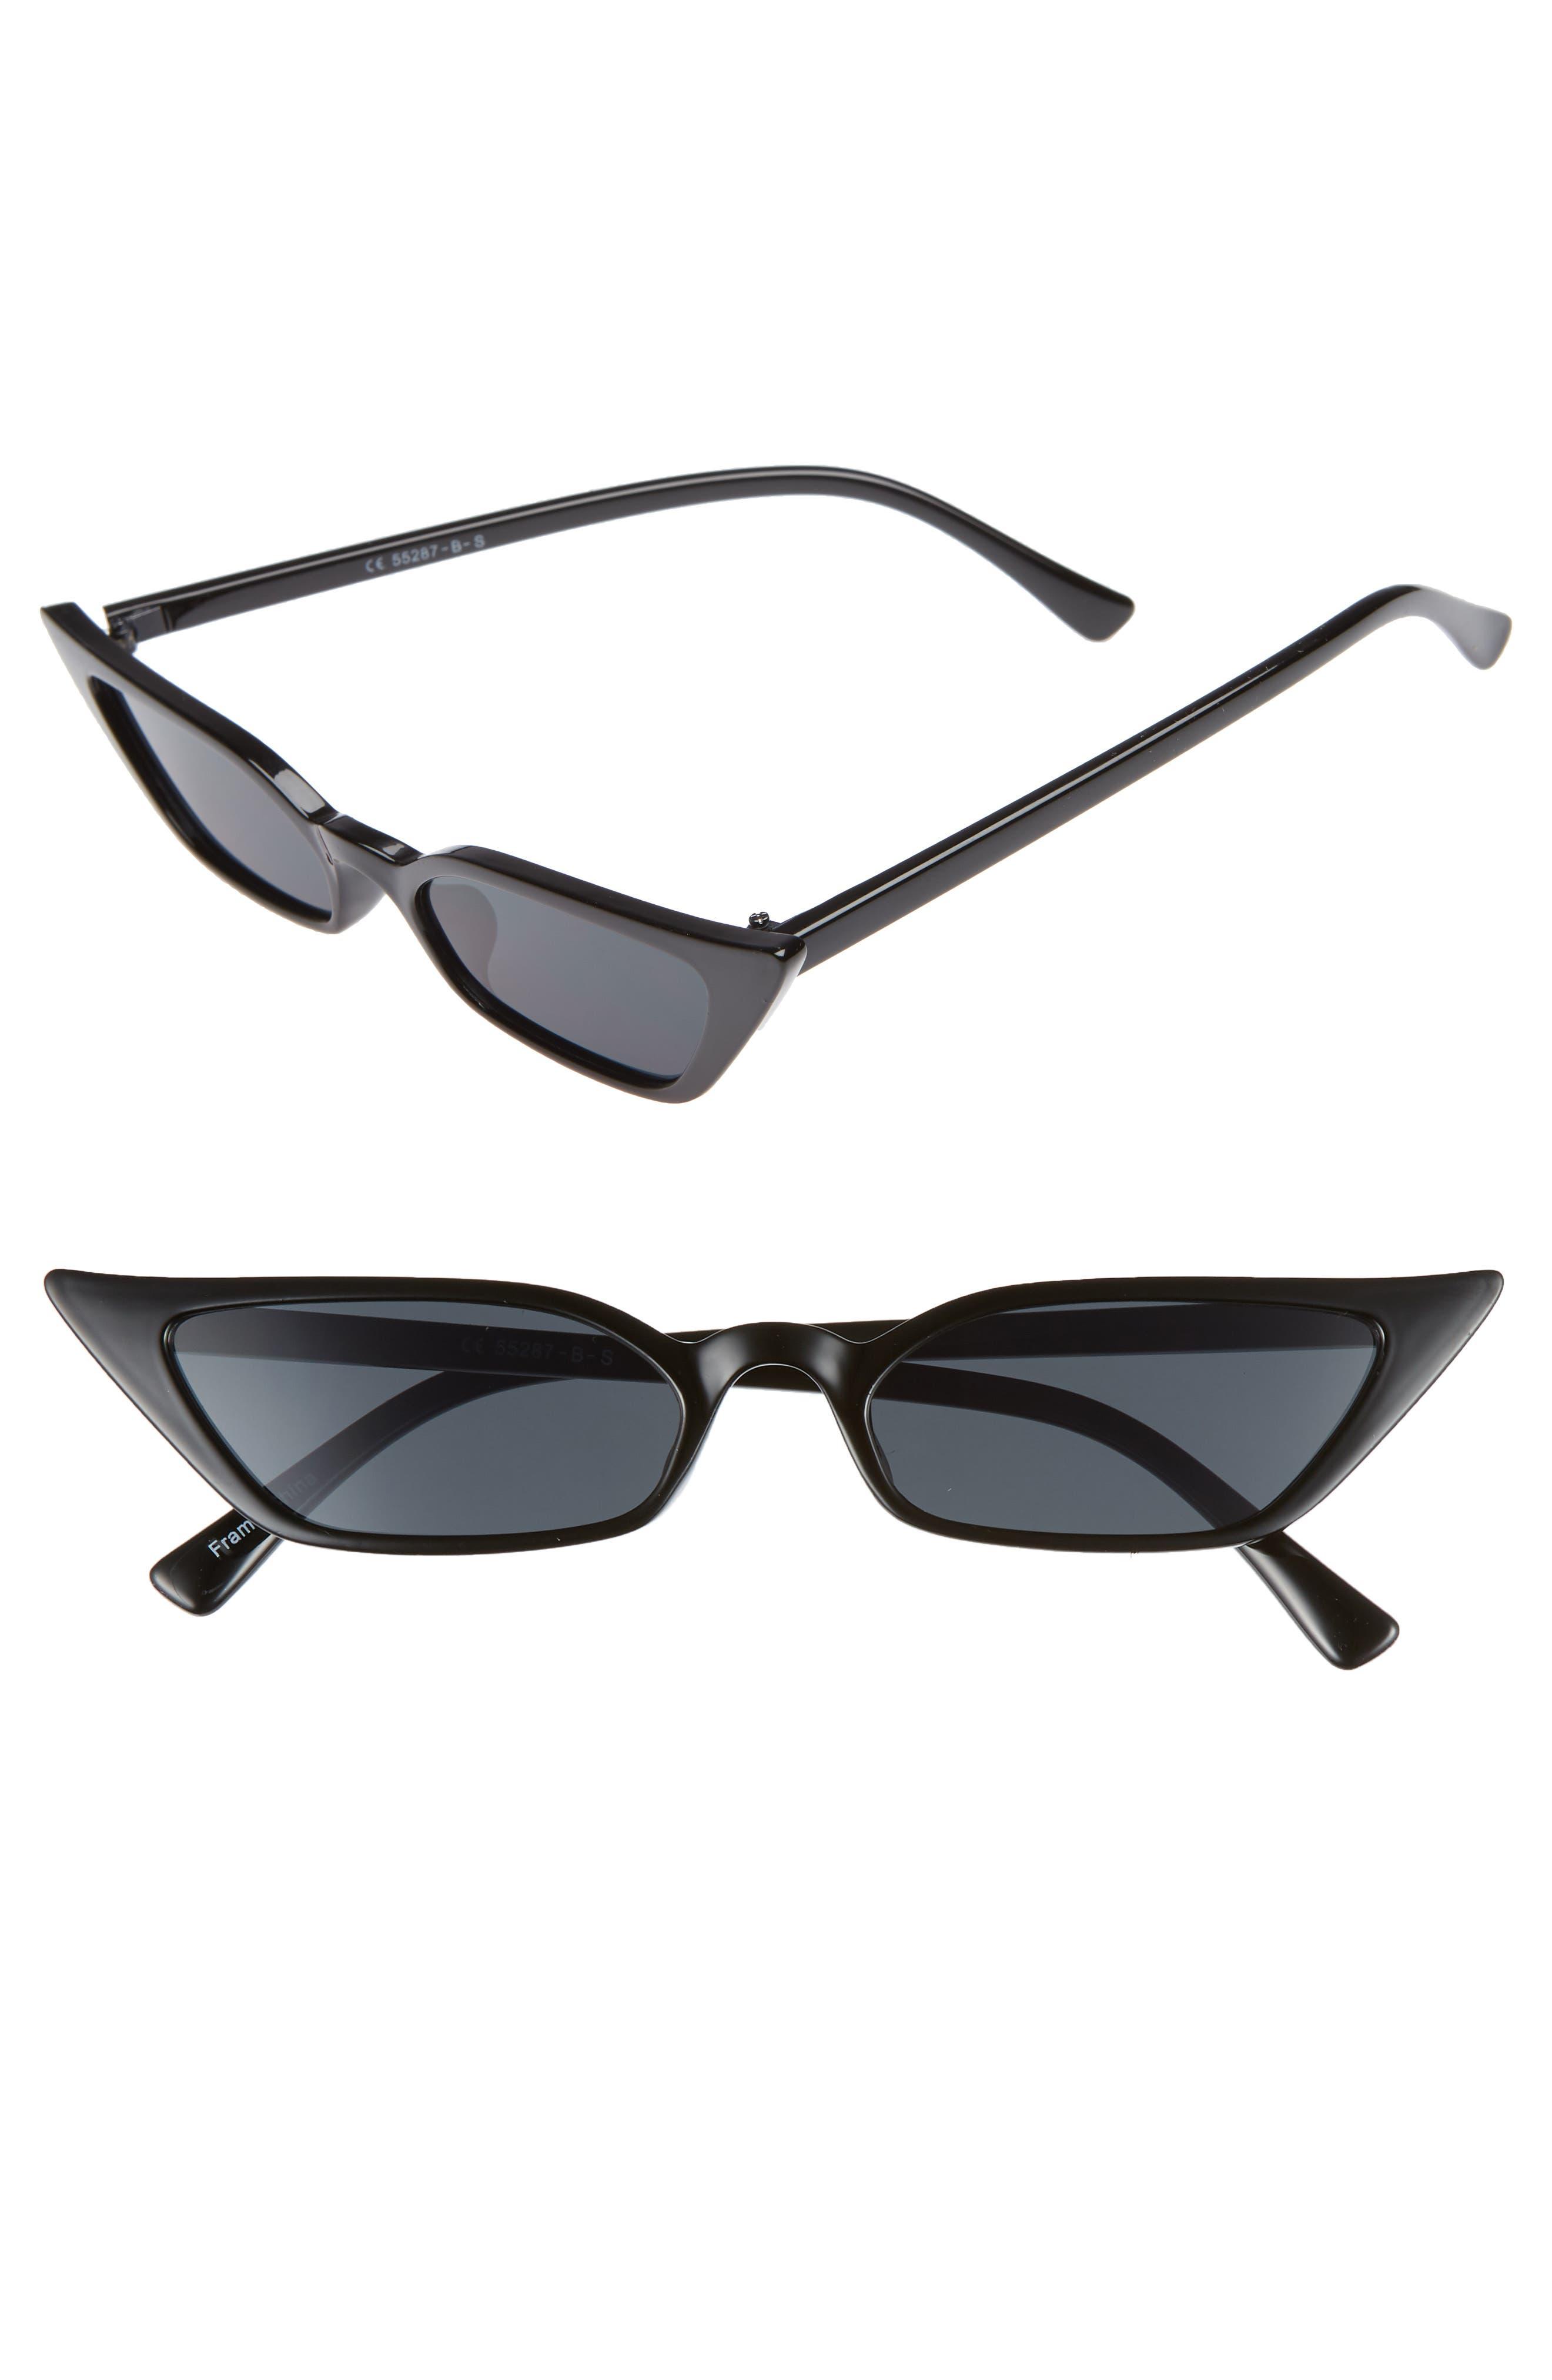 52mm Cat Eye Sunglasses,                             Main thumbnail 1, color,                             BLACK/ SMOKE LENS